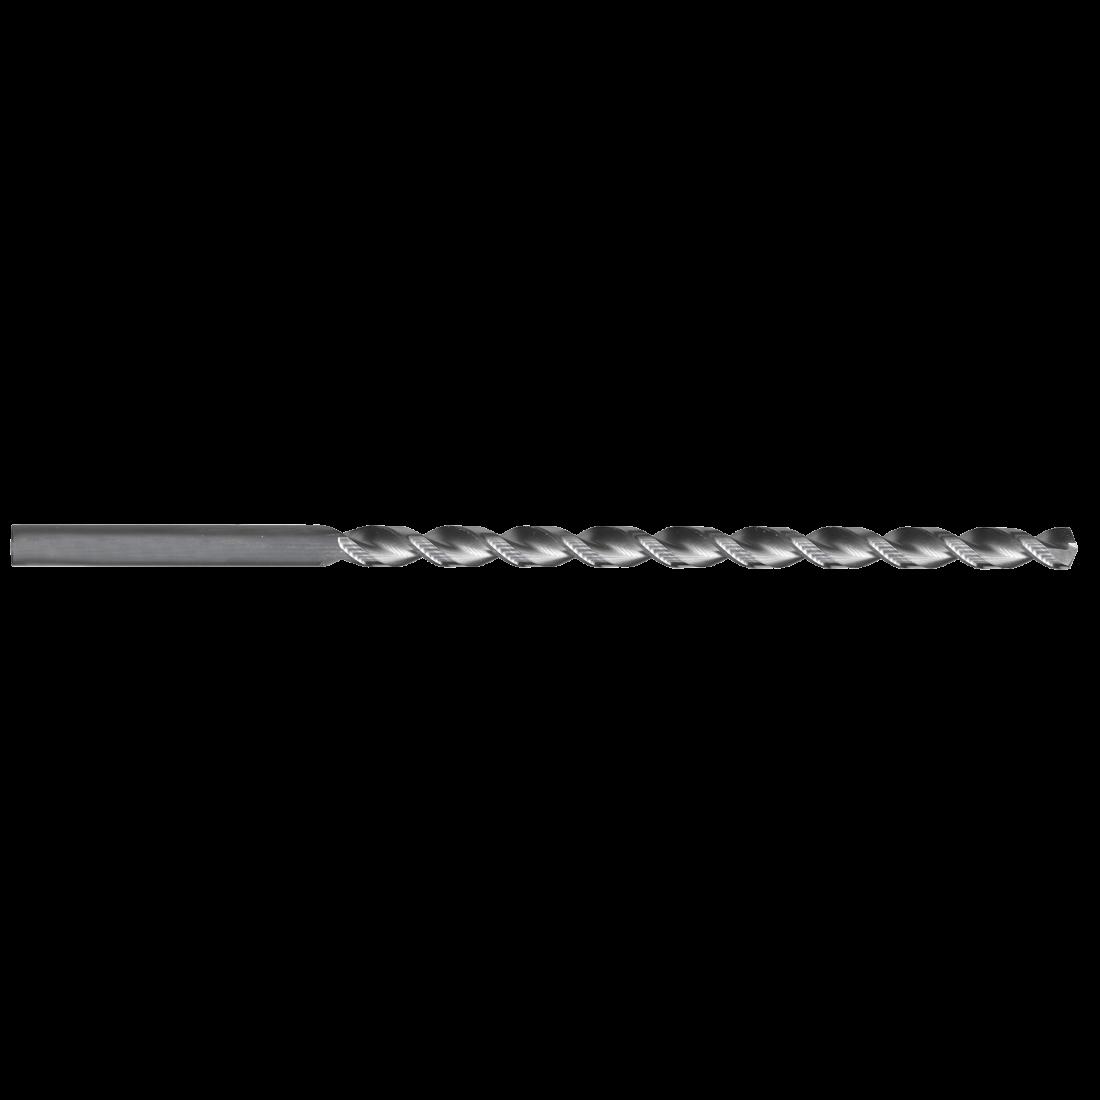 Сверло по металлу Heller HSS-G Super сверхдлинное DIN1869 10х235х340мм